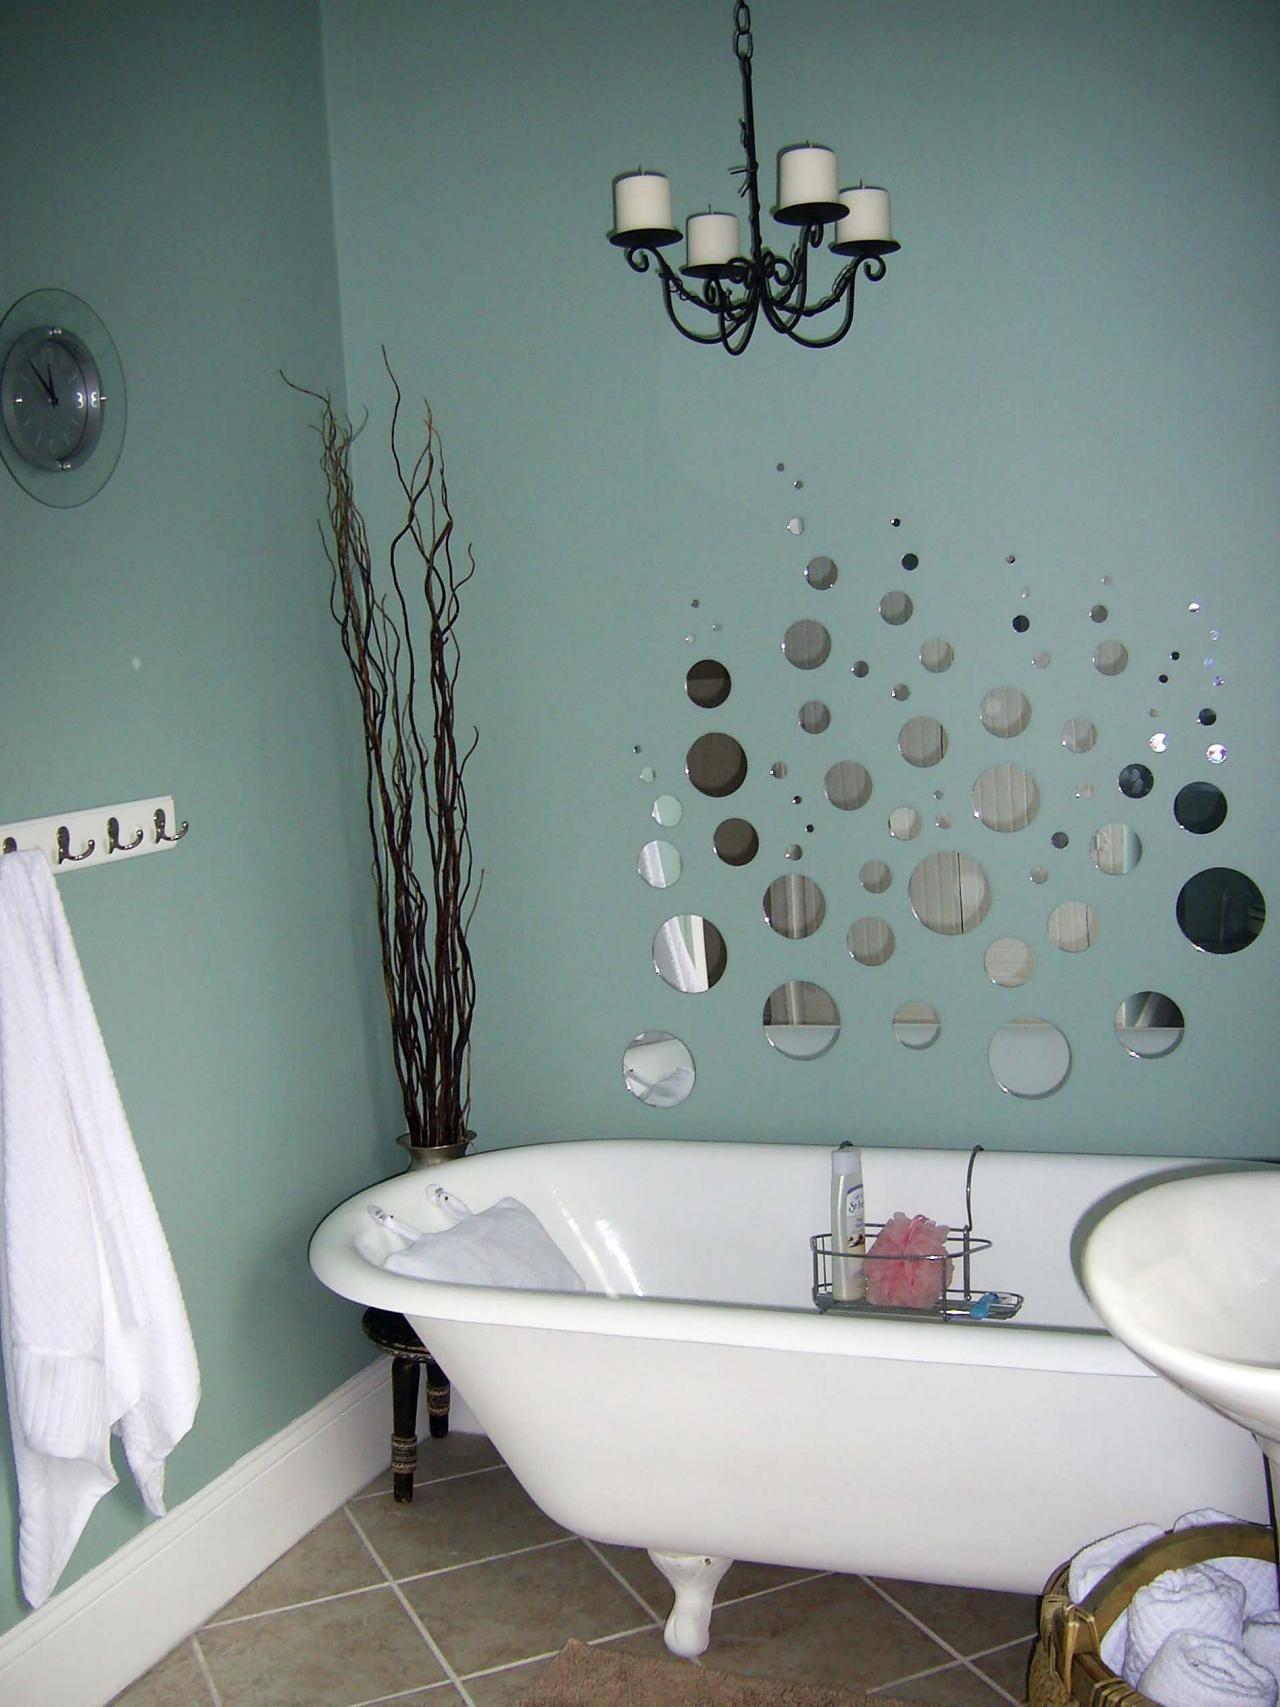 HGTV2497771-RMS_budget-bath-creative-bubbles_s3x4.jpg.rend.hgtvcom.1280.1707